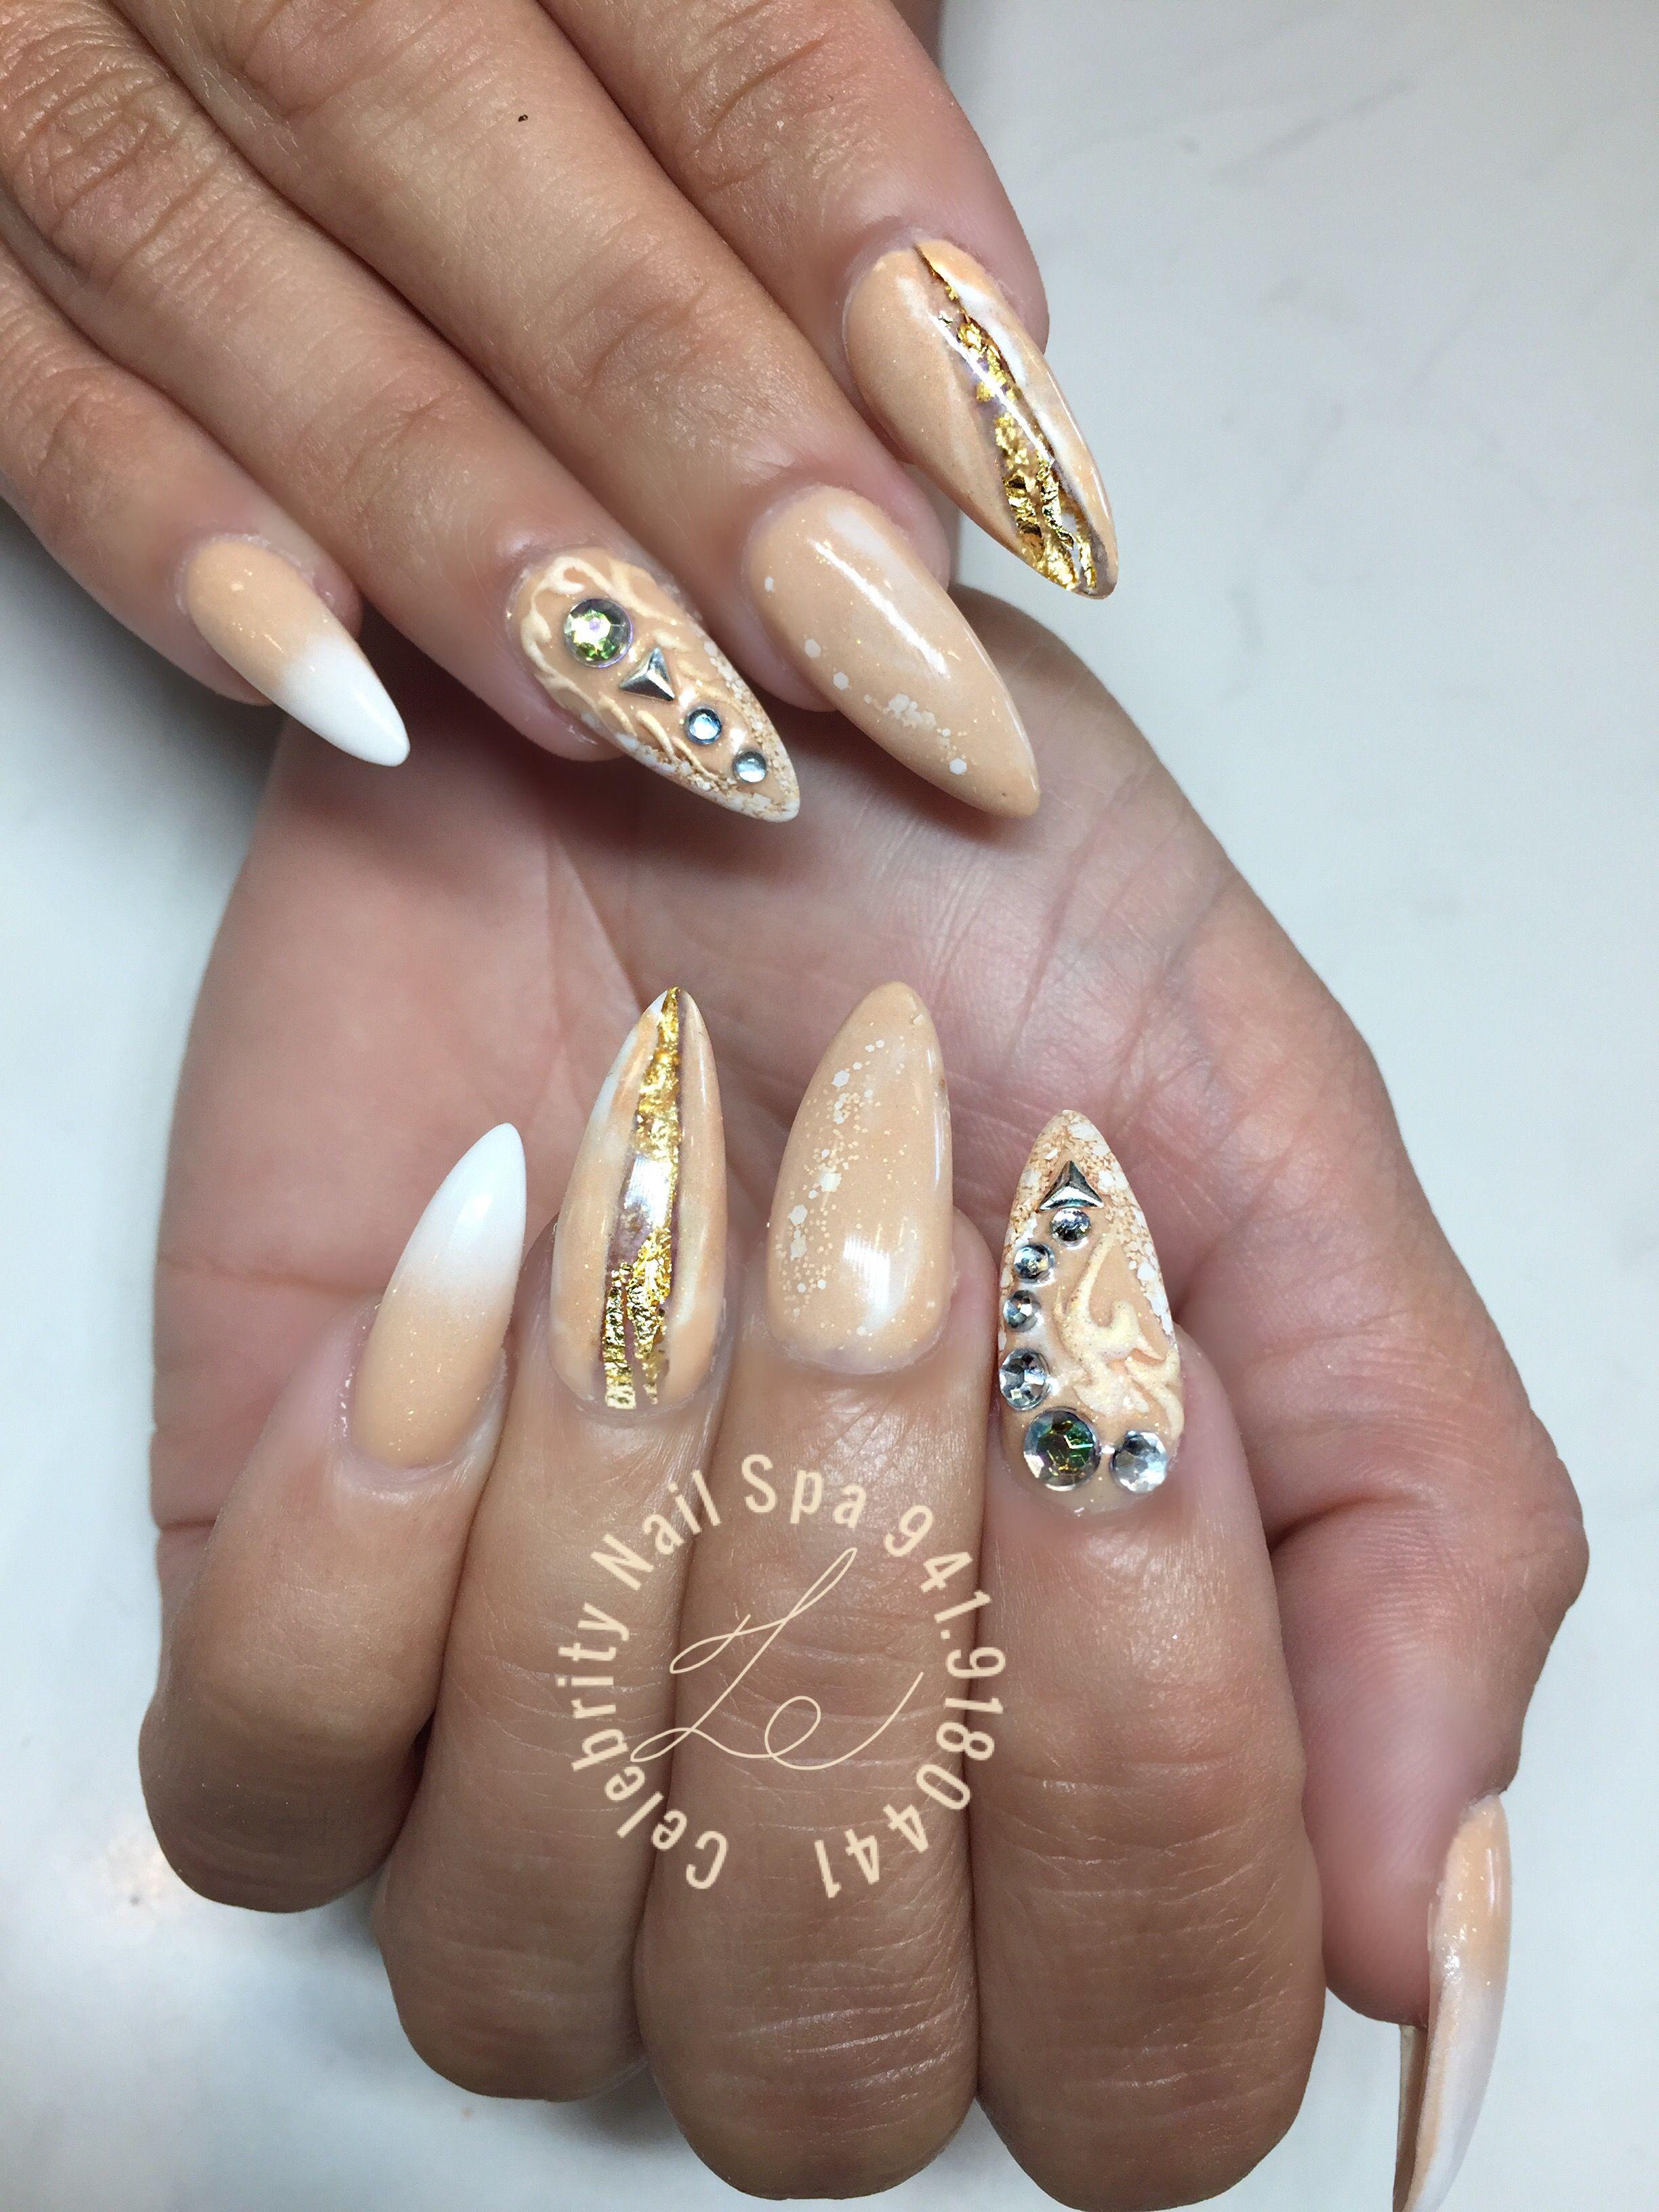 Custom designs nude all powder color | Nail art Celebrity Nail Spa ...